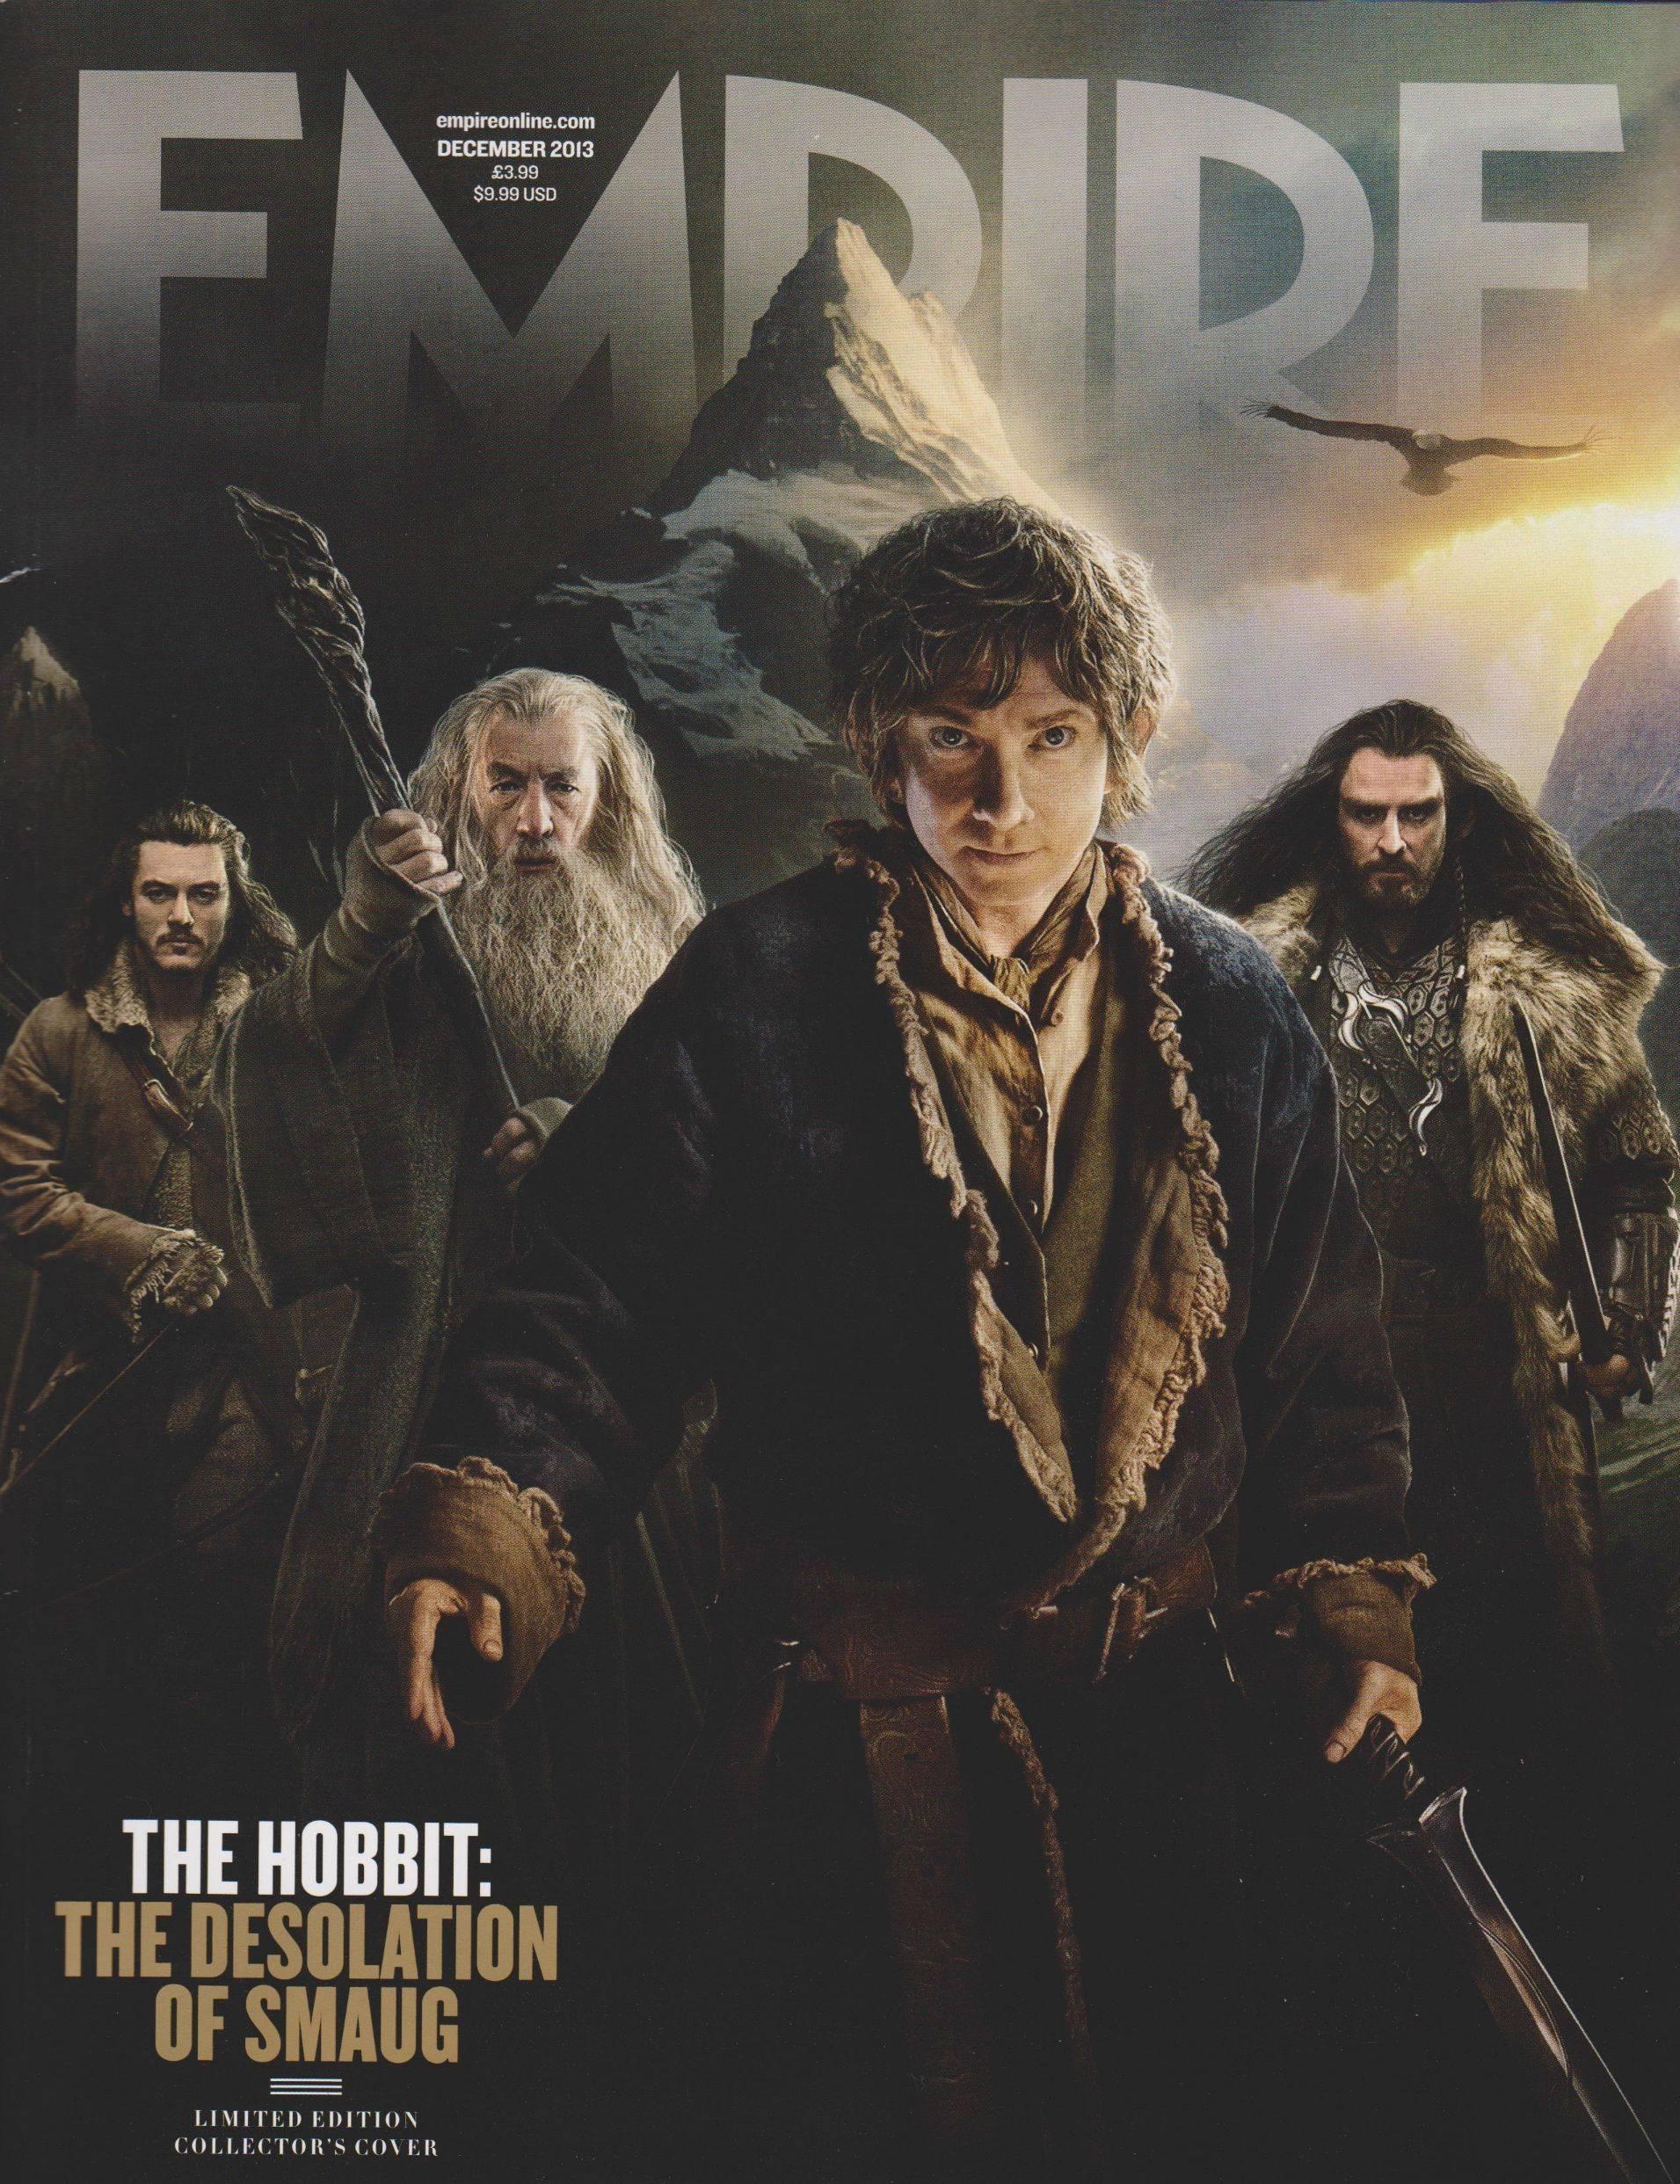 The Hobbit Empire